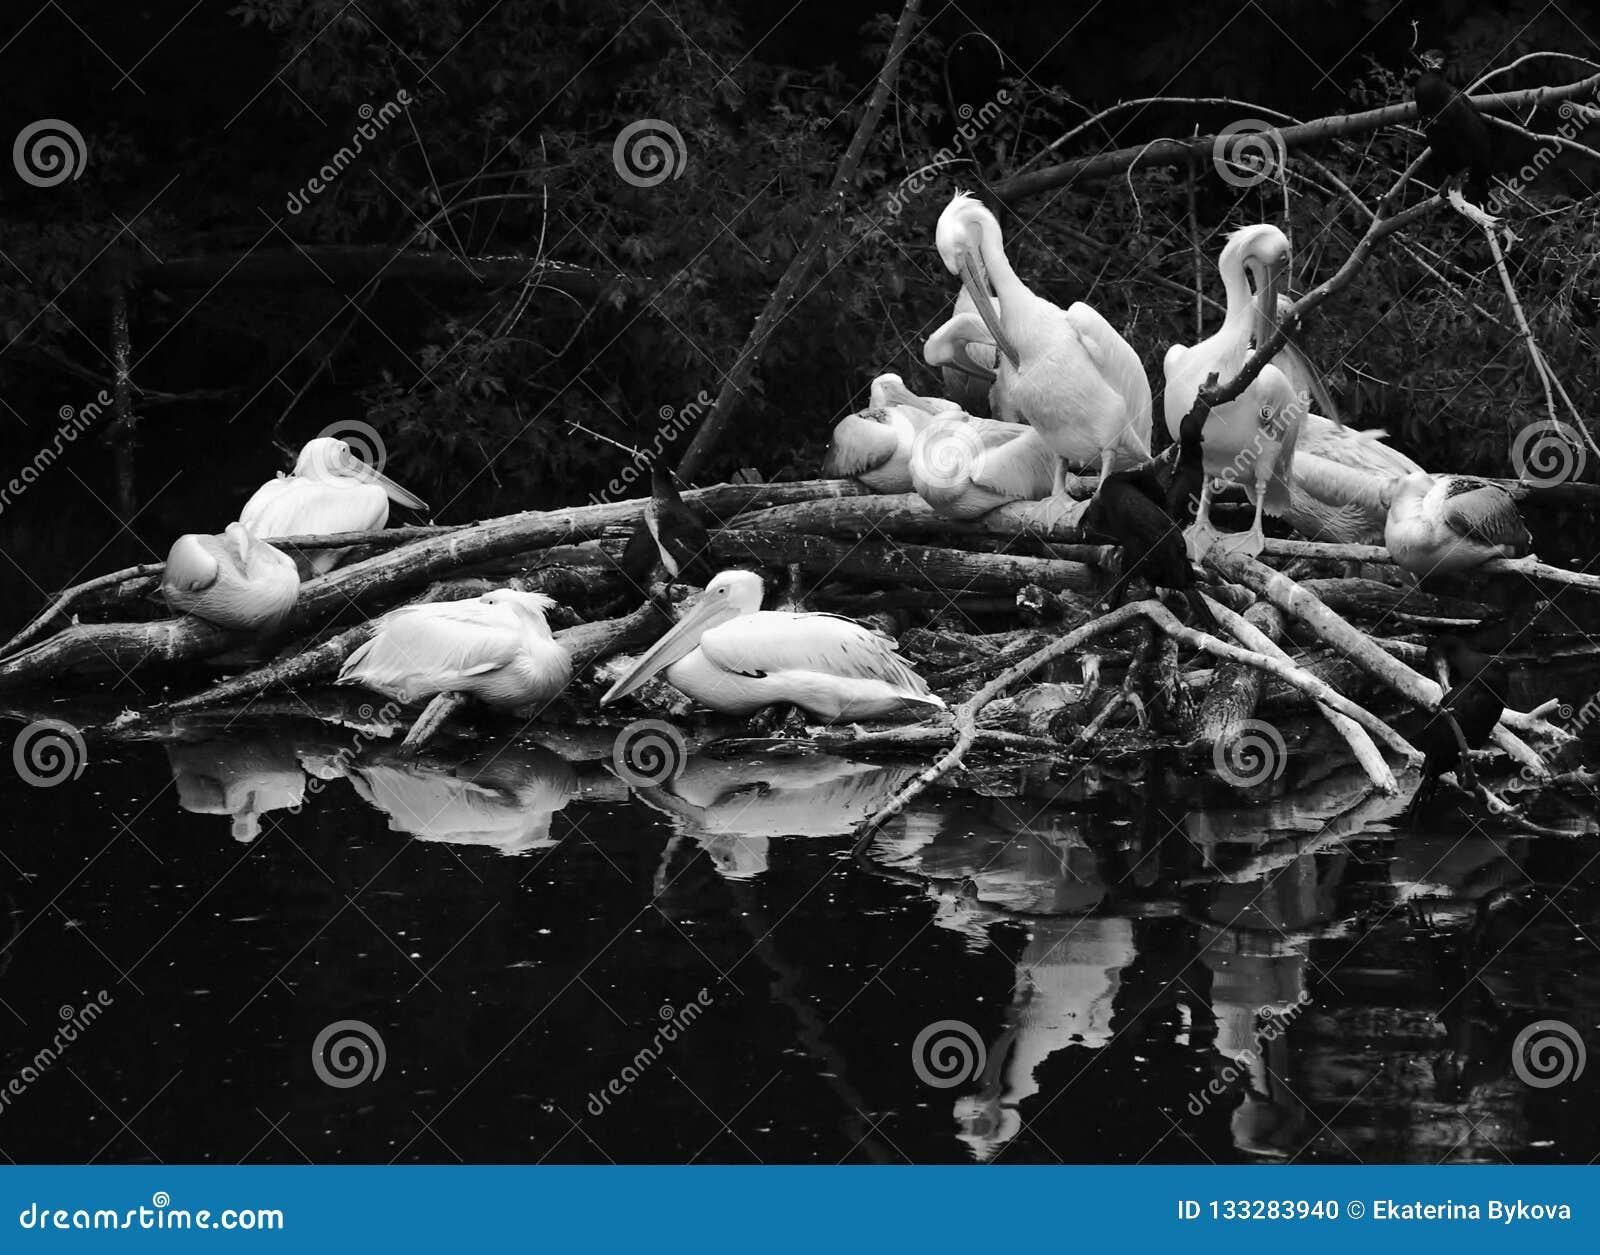 Weiße Pelikane durch Wasser Schwarzweiss-Foto Pekings, China